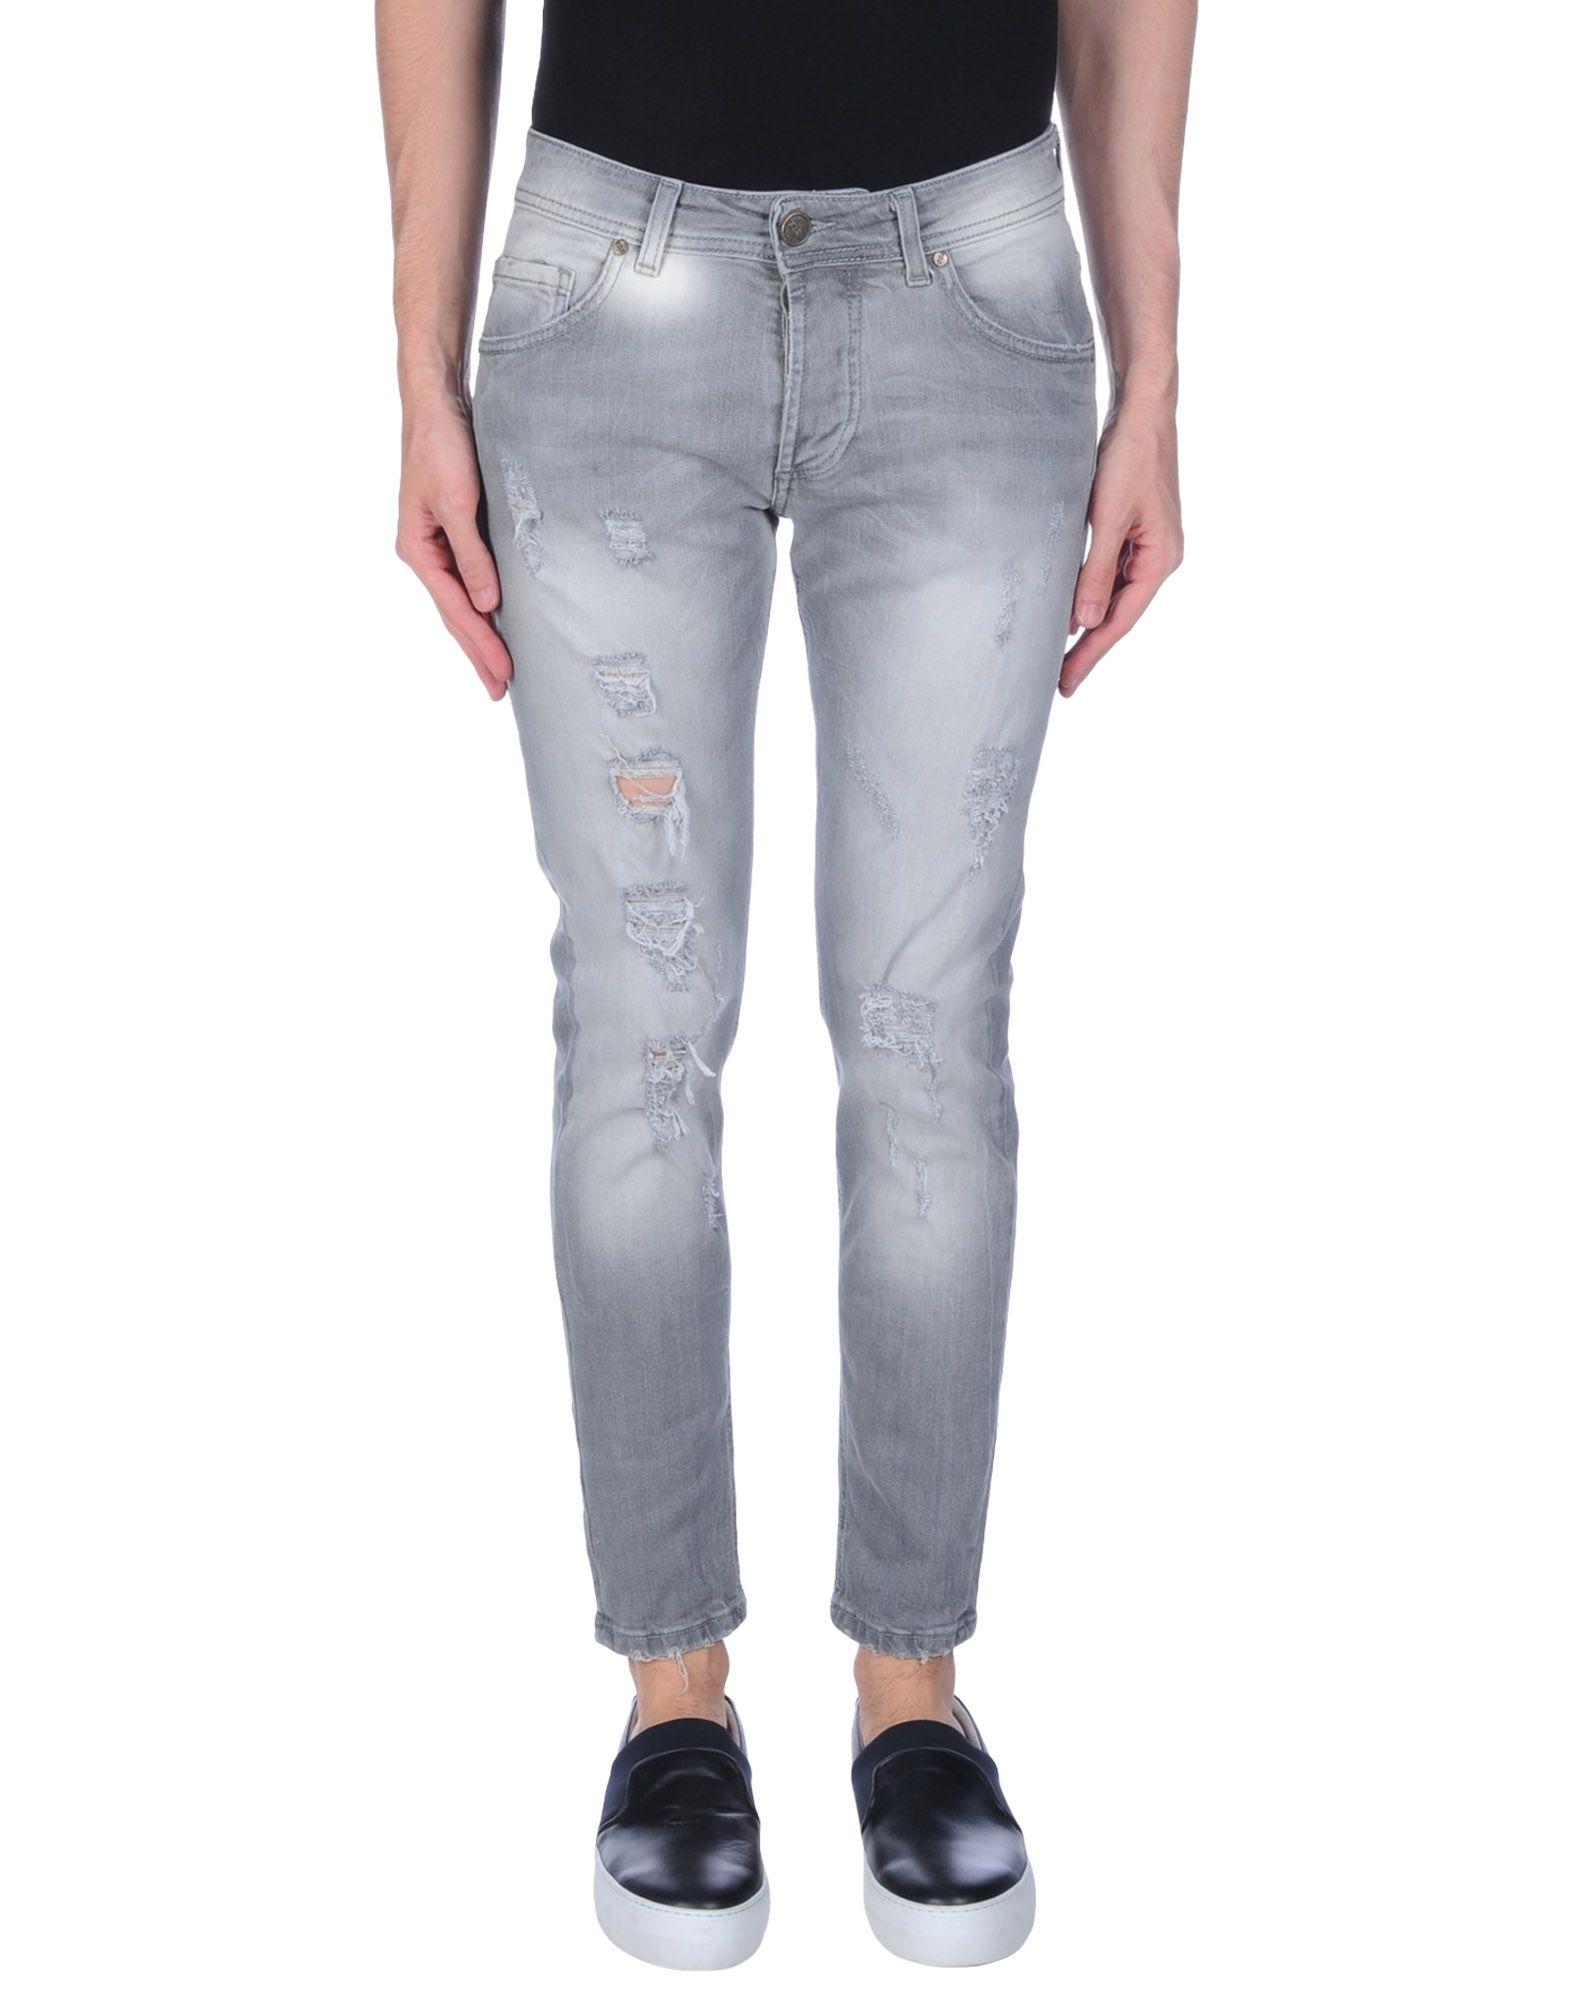 Pantaloni Jeans Erossoi Del Duca Uomo - - - 42625005MV ea665b